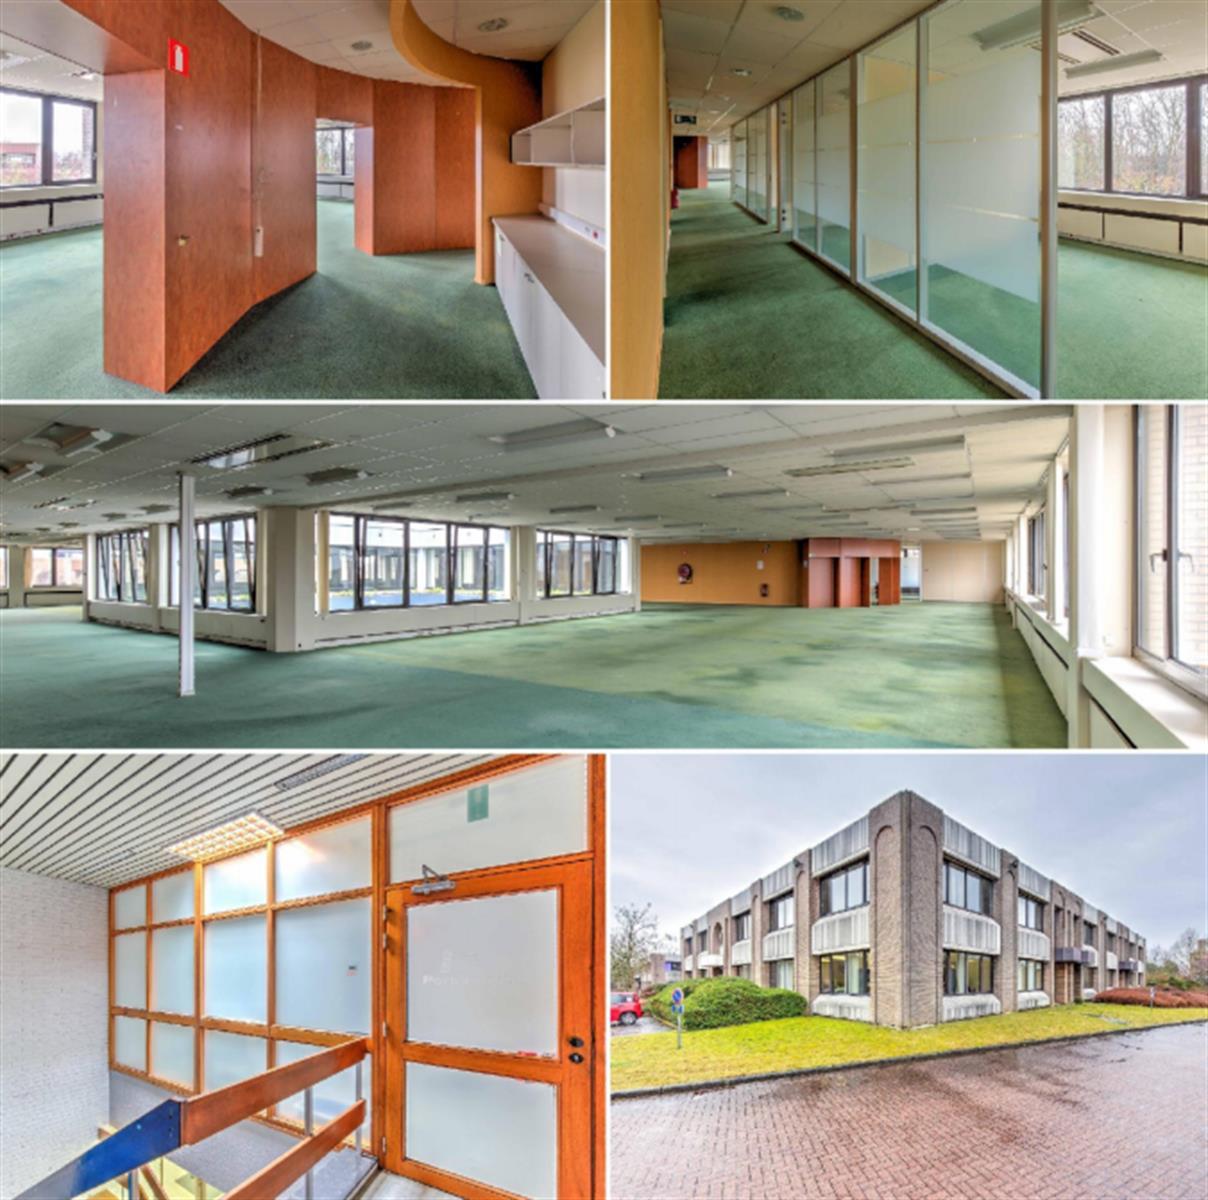 kantoor te koop VV2006 - Kantoorgebouw - Imperiastraat 8, 1930 Zaventem, België 3